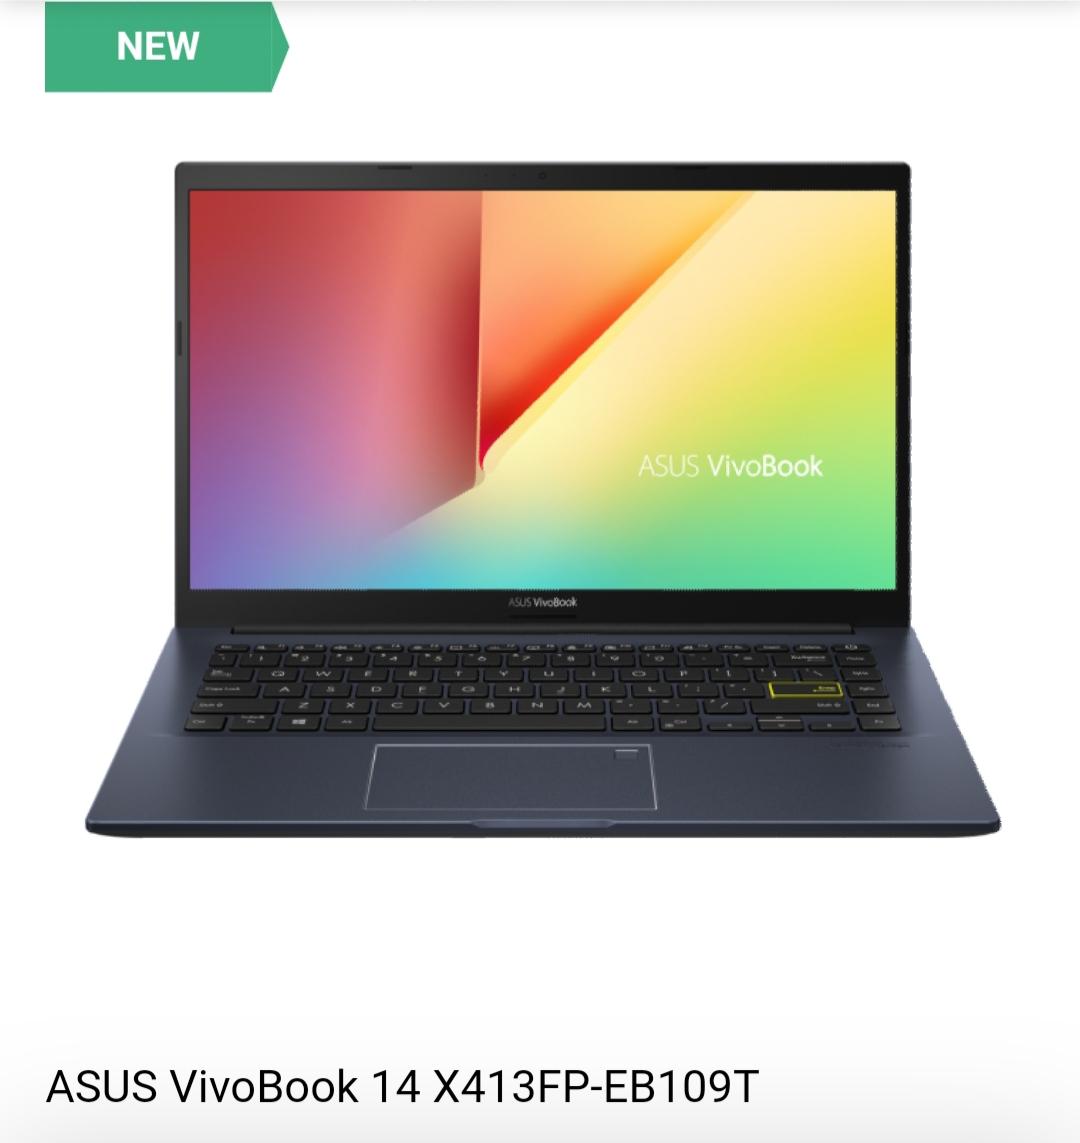 Asus VivoBook 14x413FP Main view